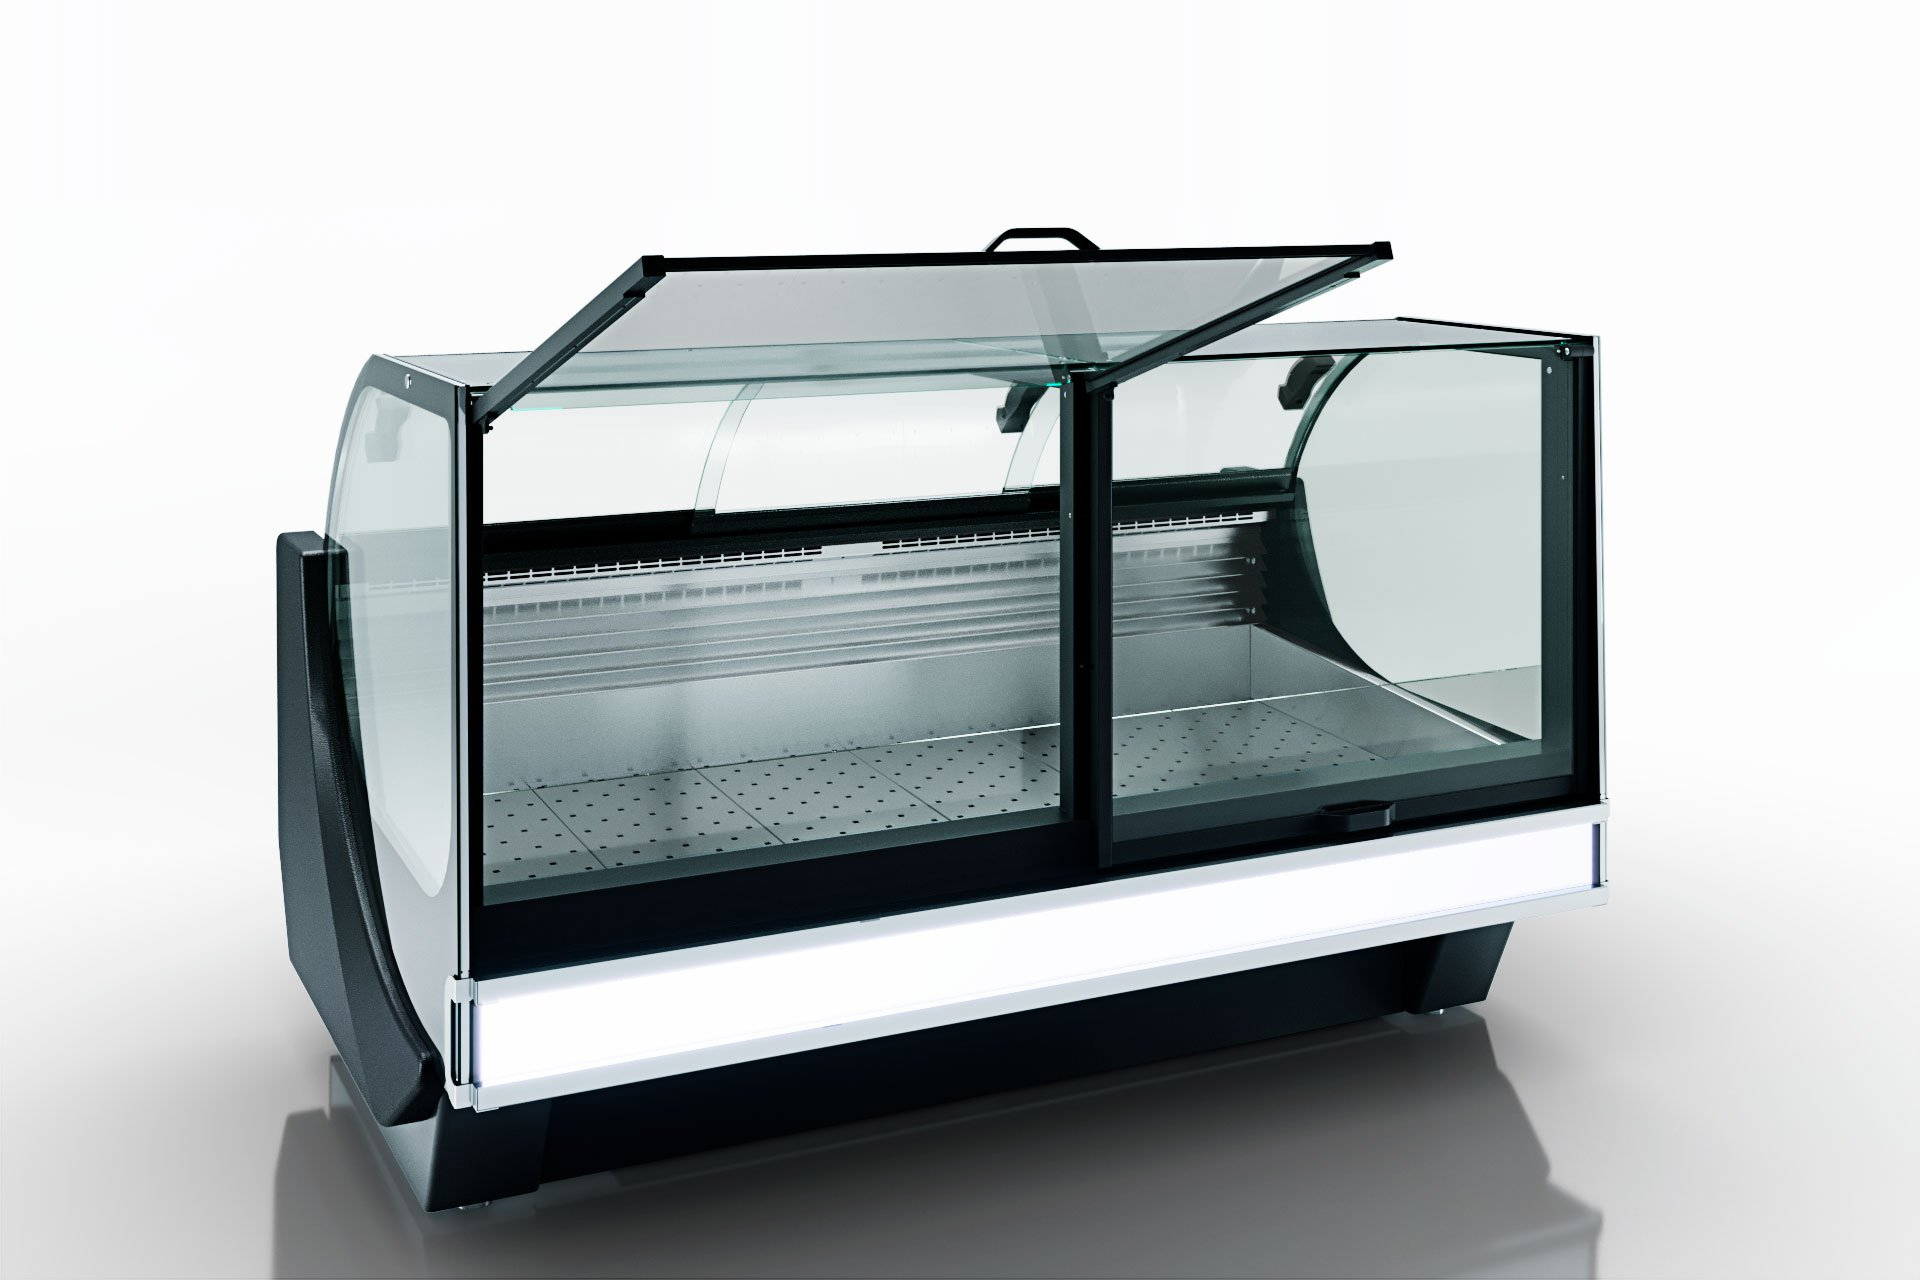 מקרר ויטרינה MISSOURI COLD DIAMOND MC 115 FISH PS M/A – NEW